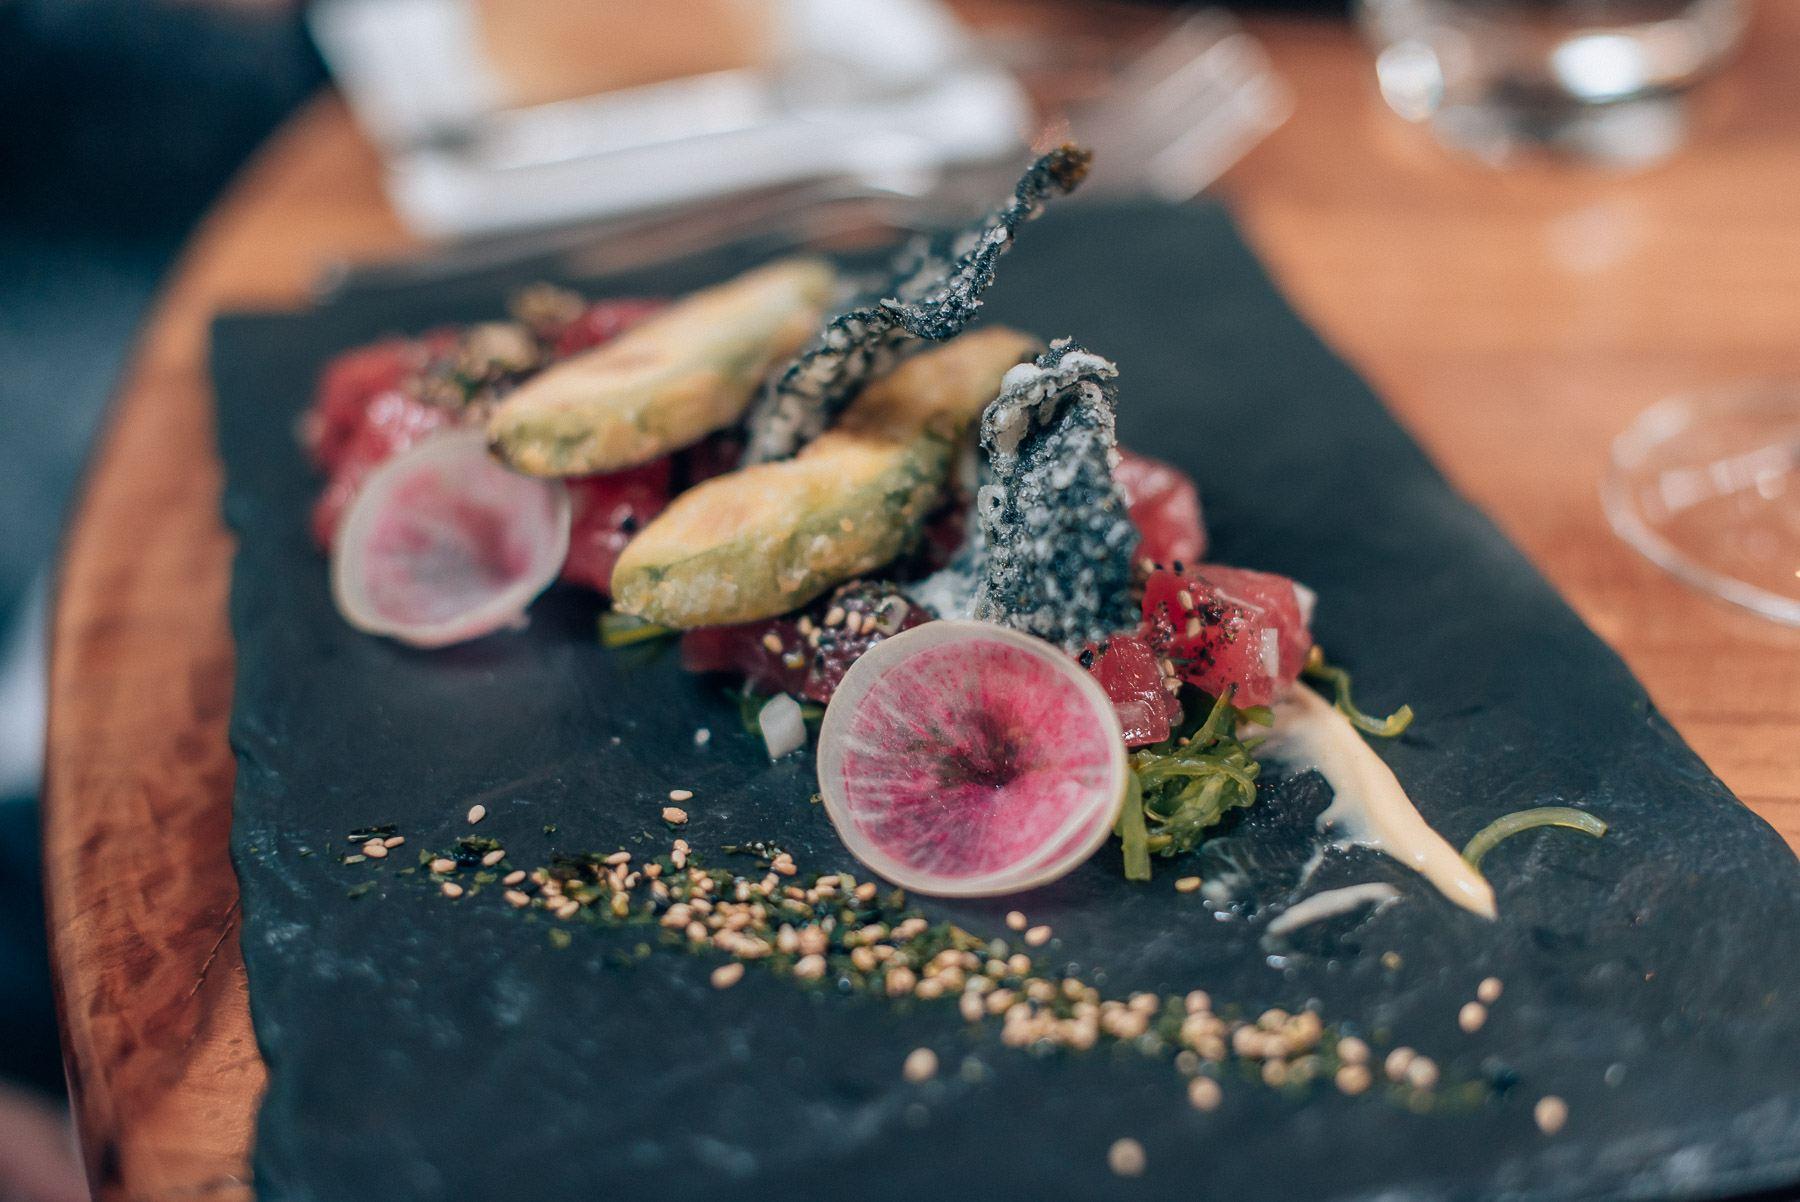 The Best Restaurants in Healdsburg